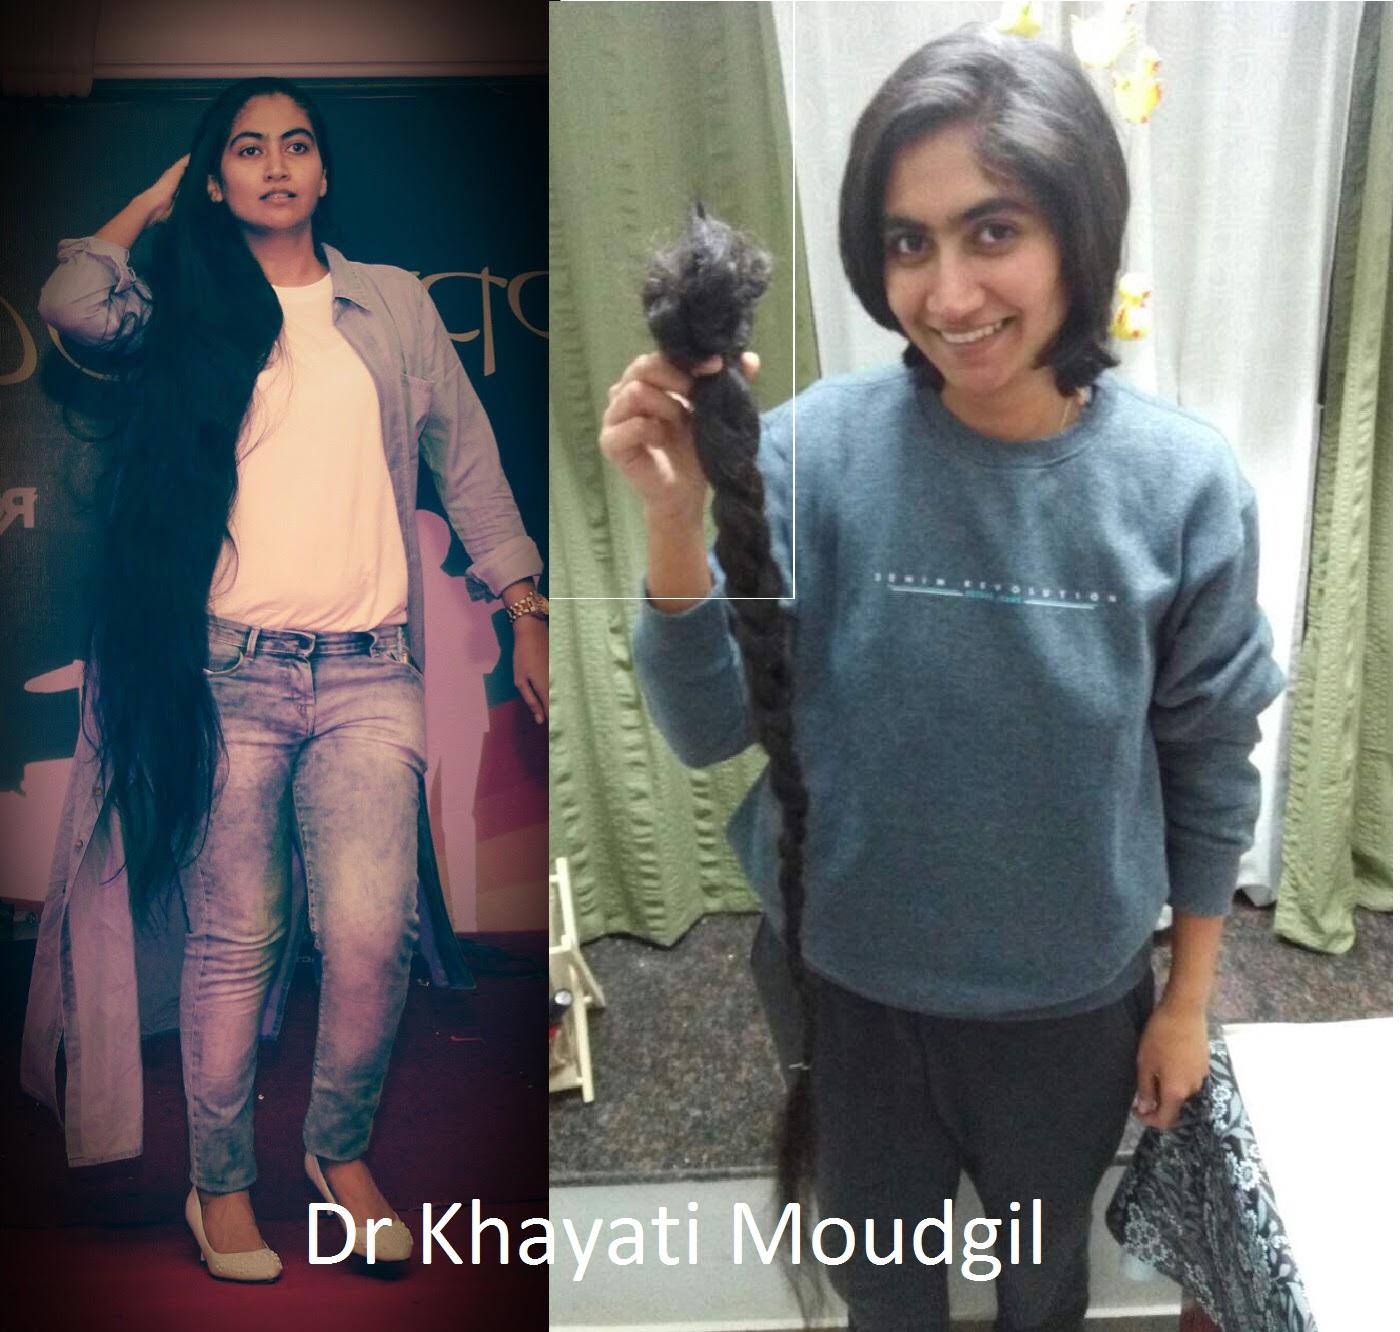 Dr Khayati Moudgil